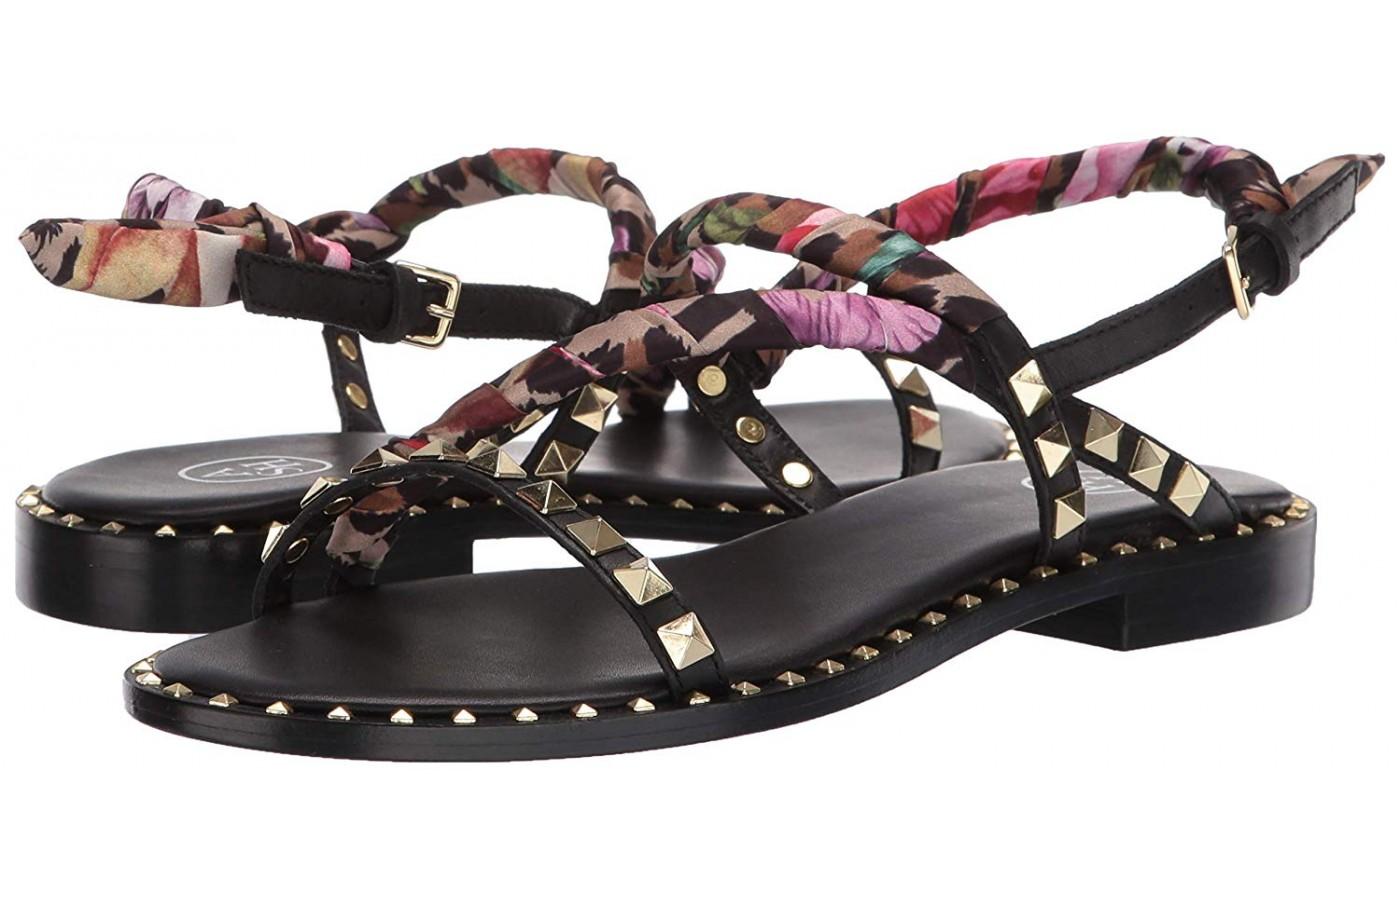 The Pattaya's mixed materials shine on this black pair.